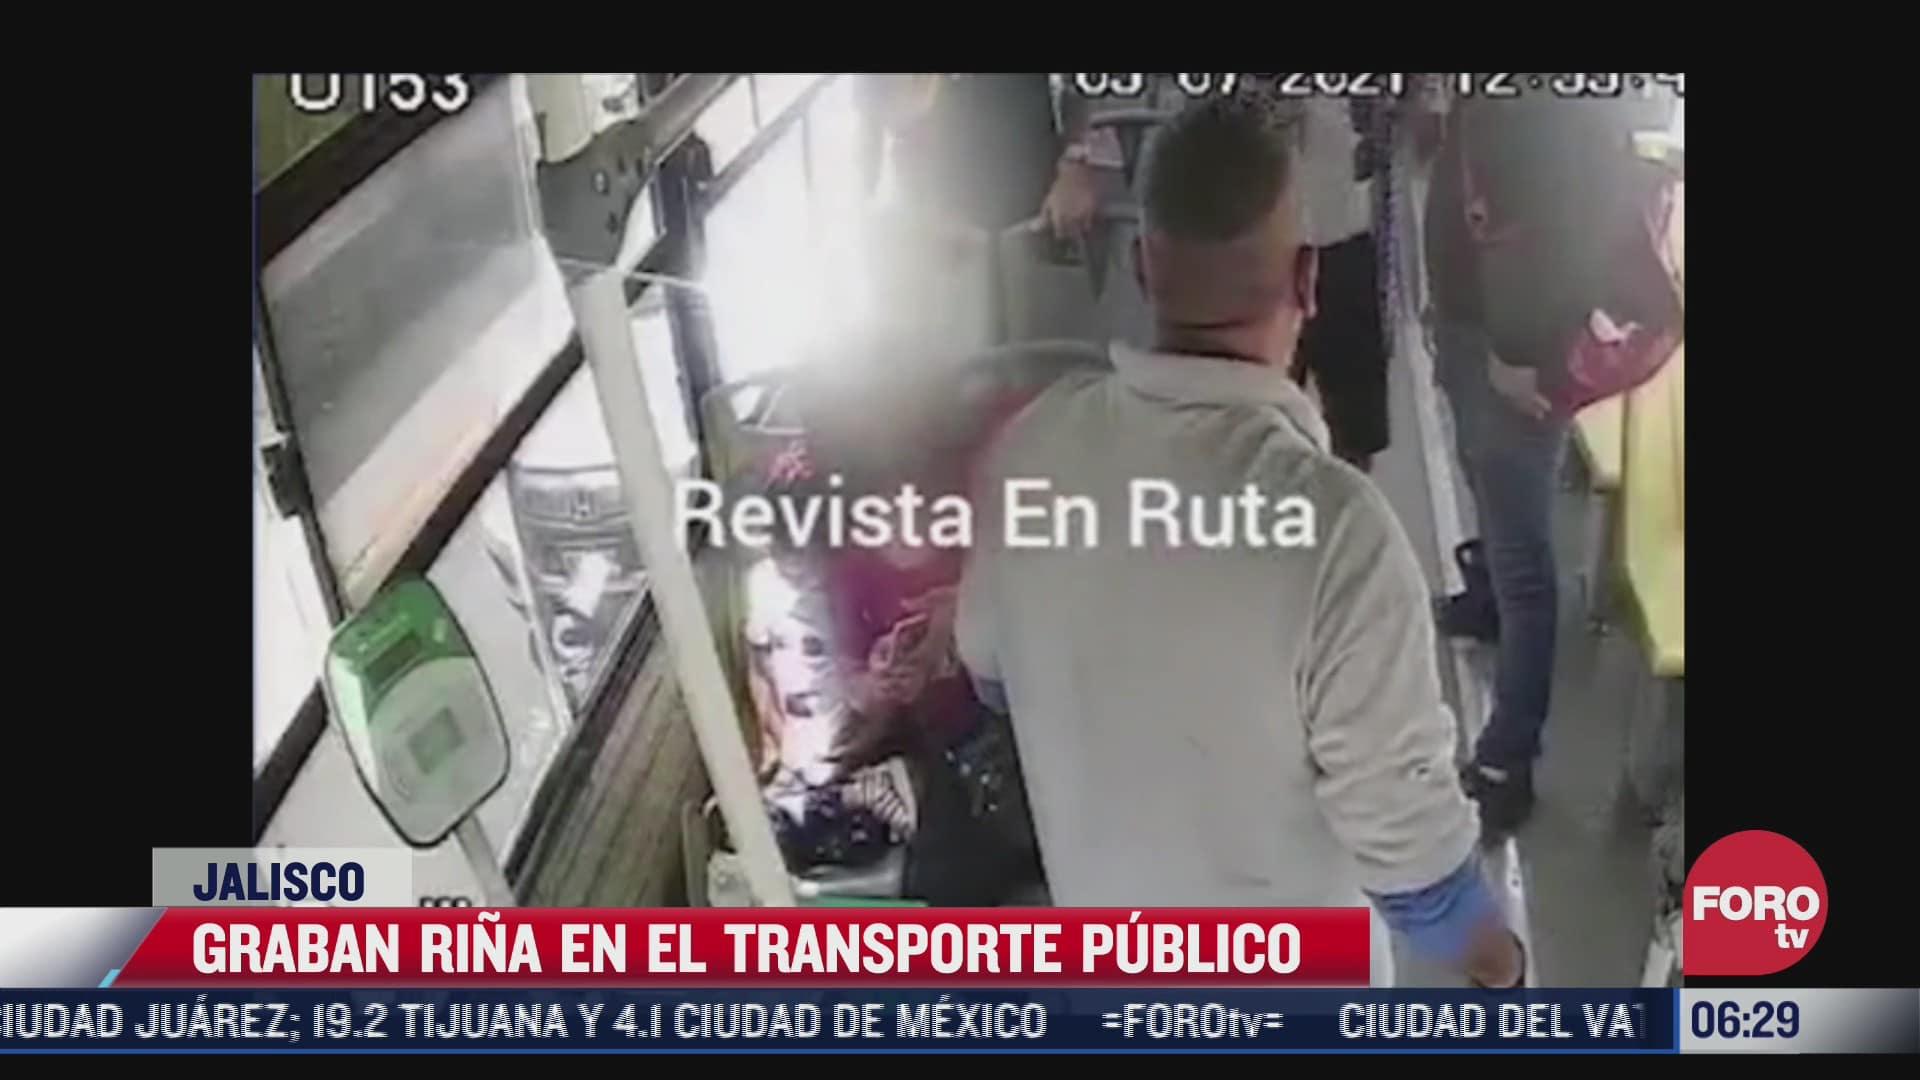 pasajero y chofer se agarran a golpes en camion de transporte publico